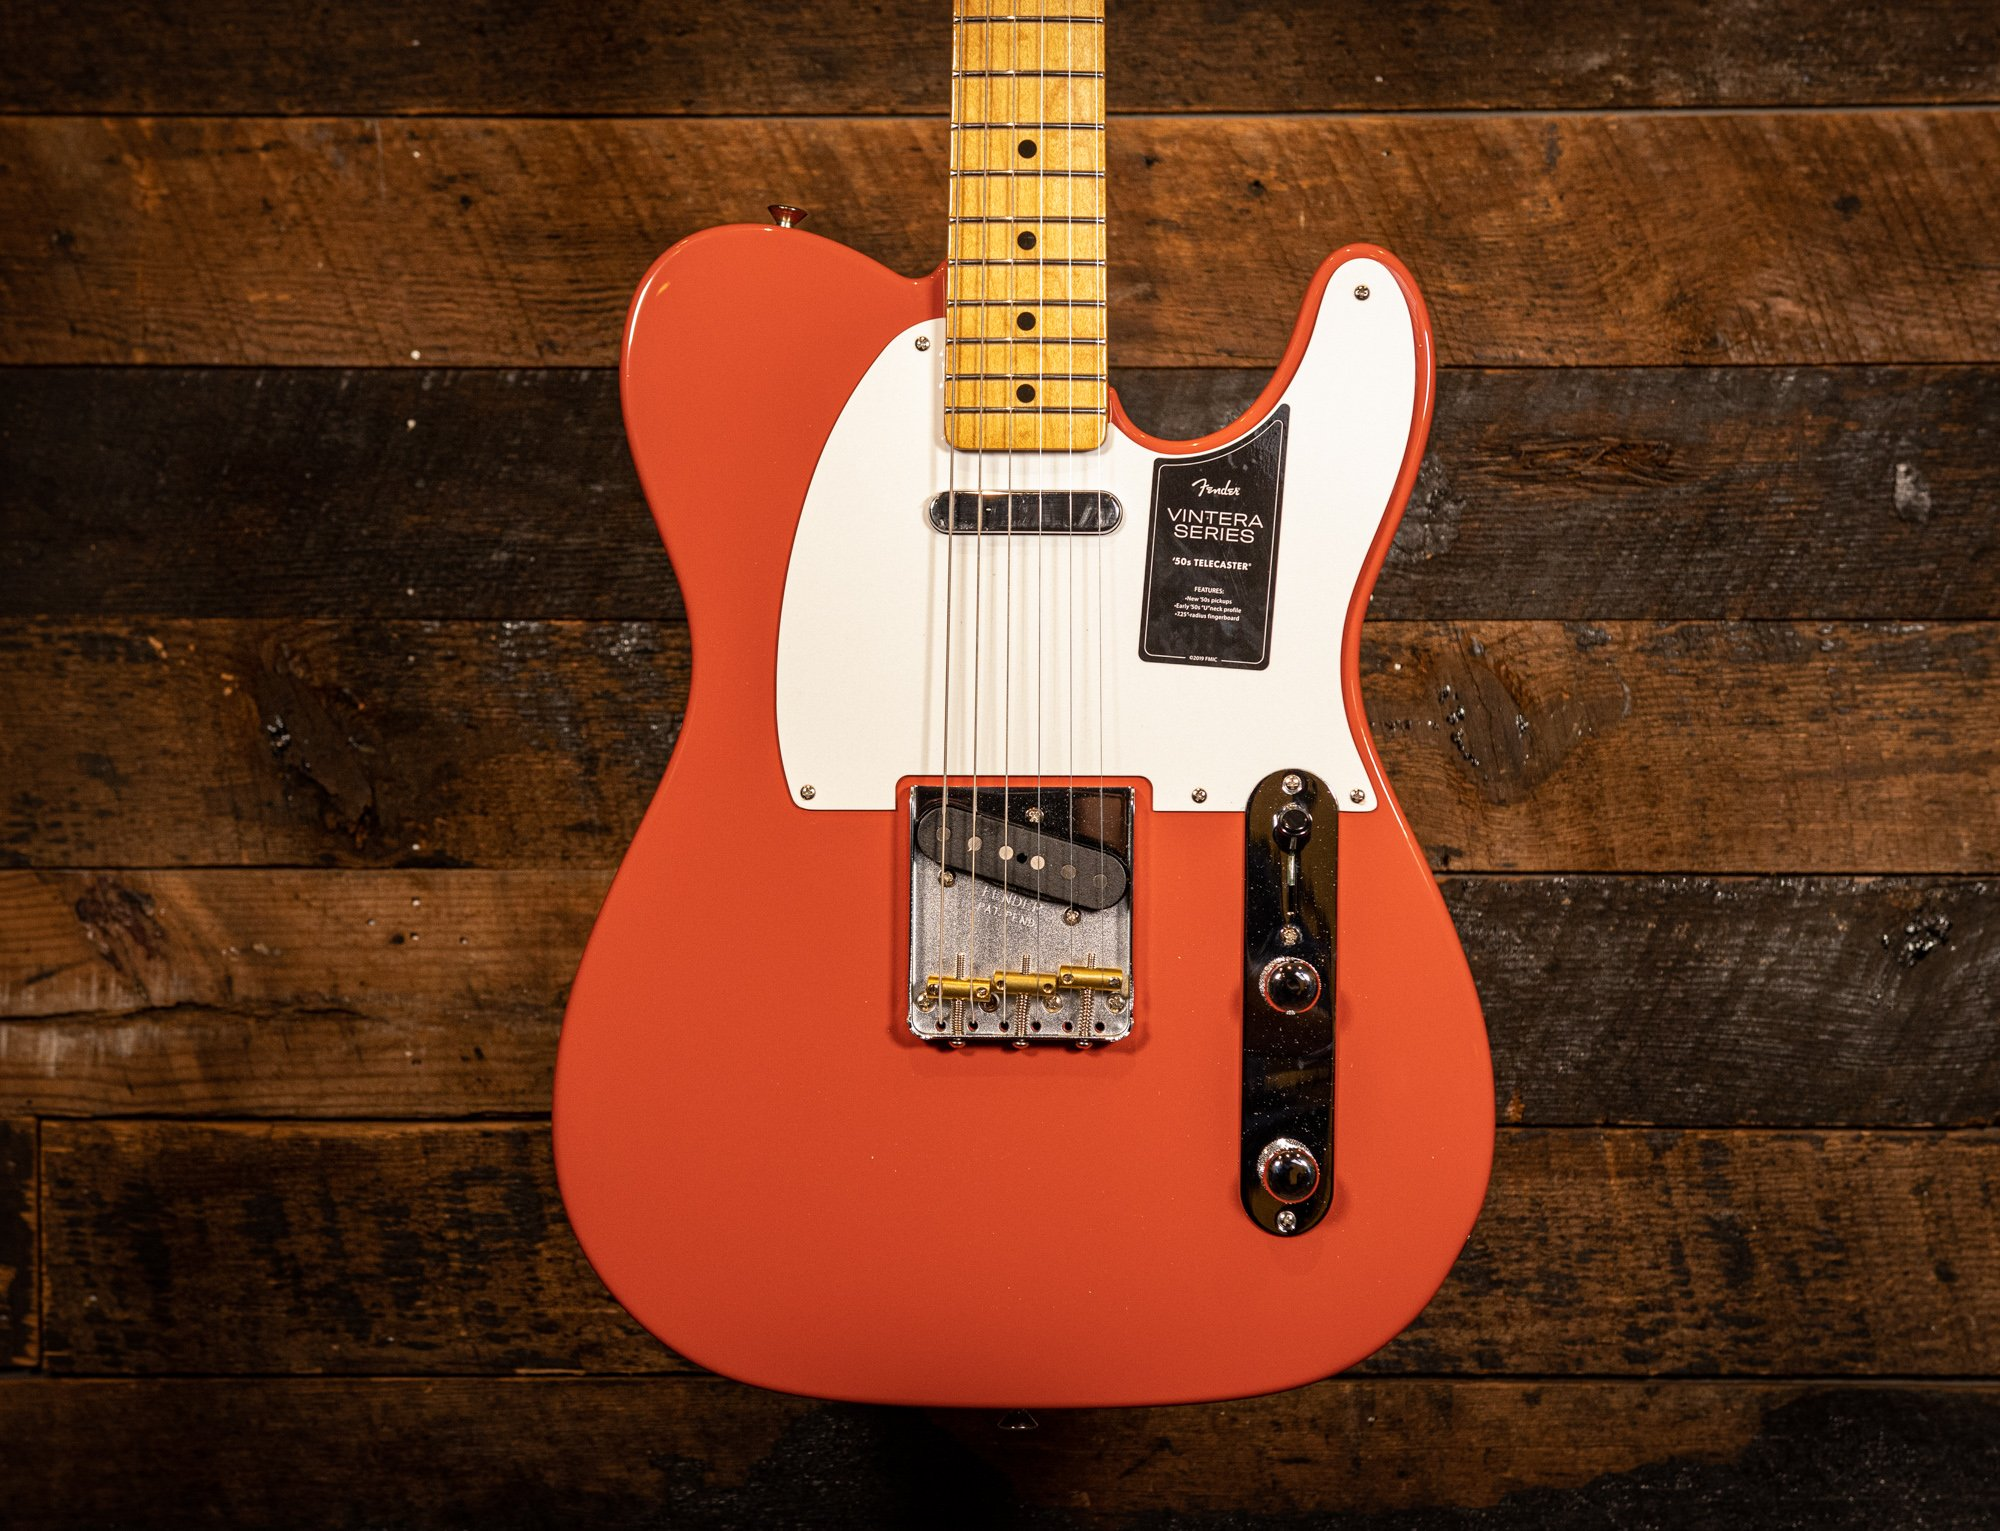 Fender Vintera 50's Telecaster in Fiesta Red